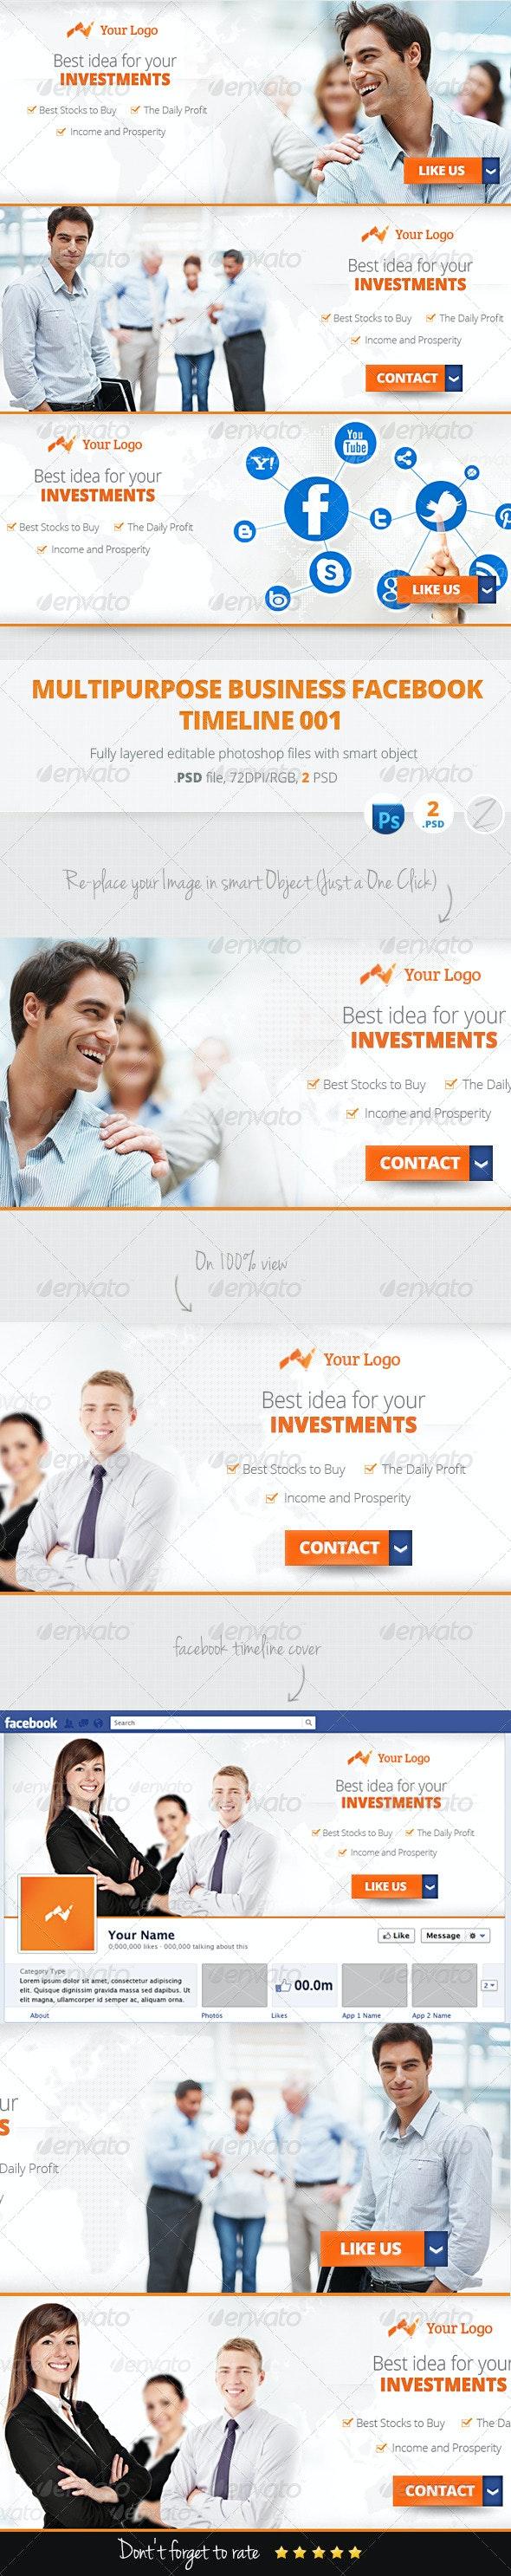 Multipurpose Business Marketing Facebook Cover 001 - Facebook Timeline Covers Social Media